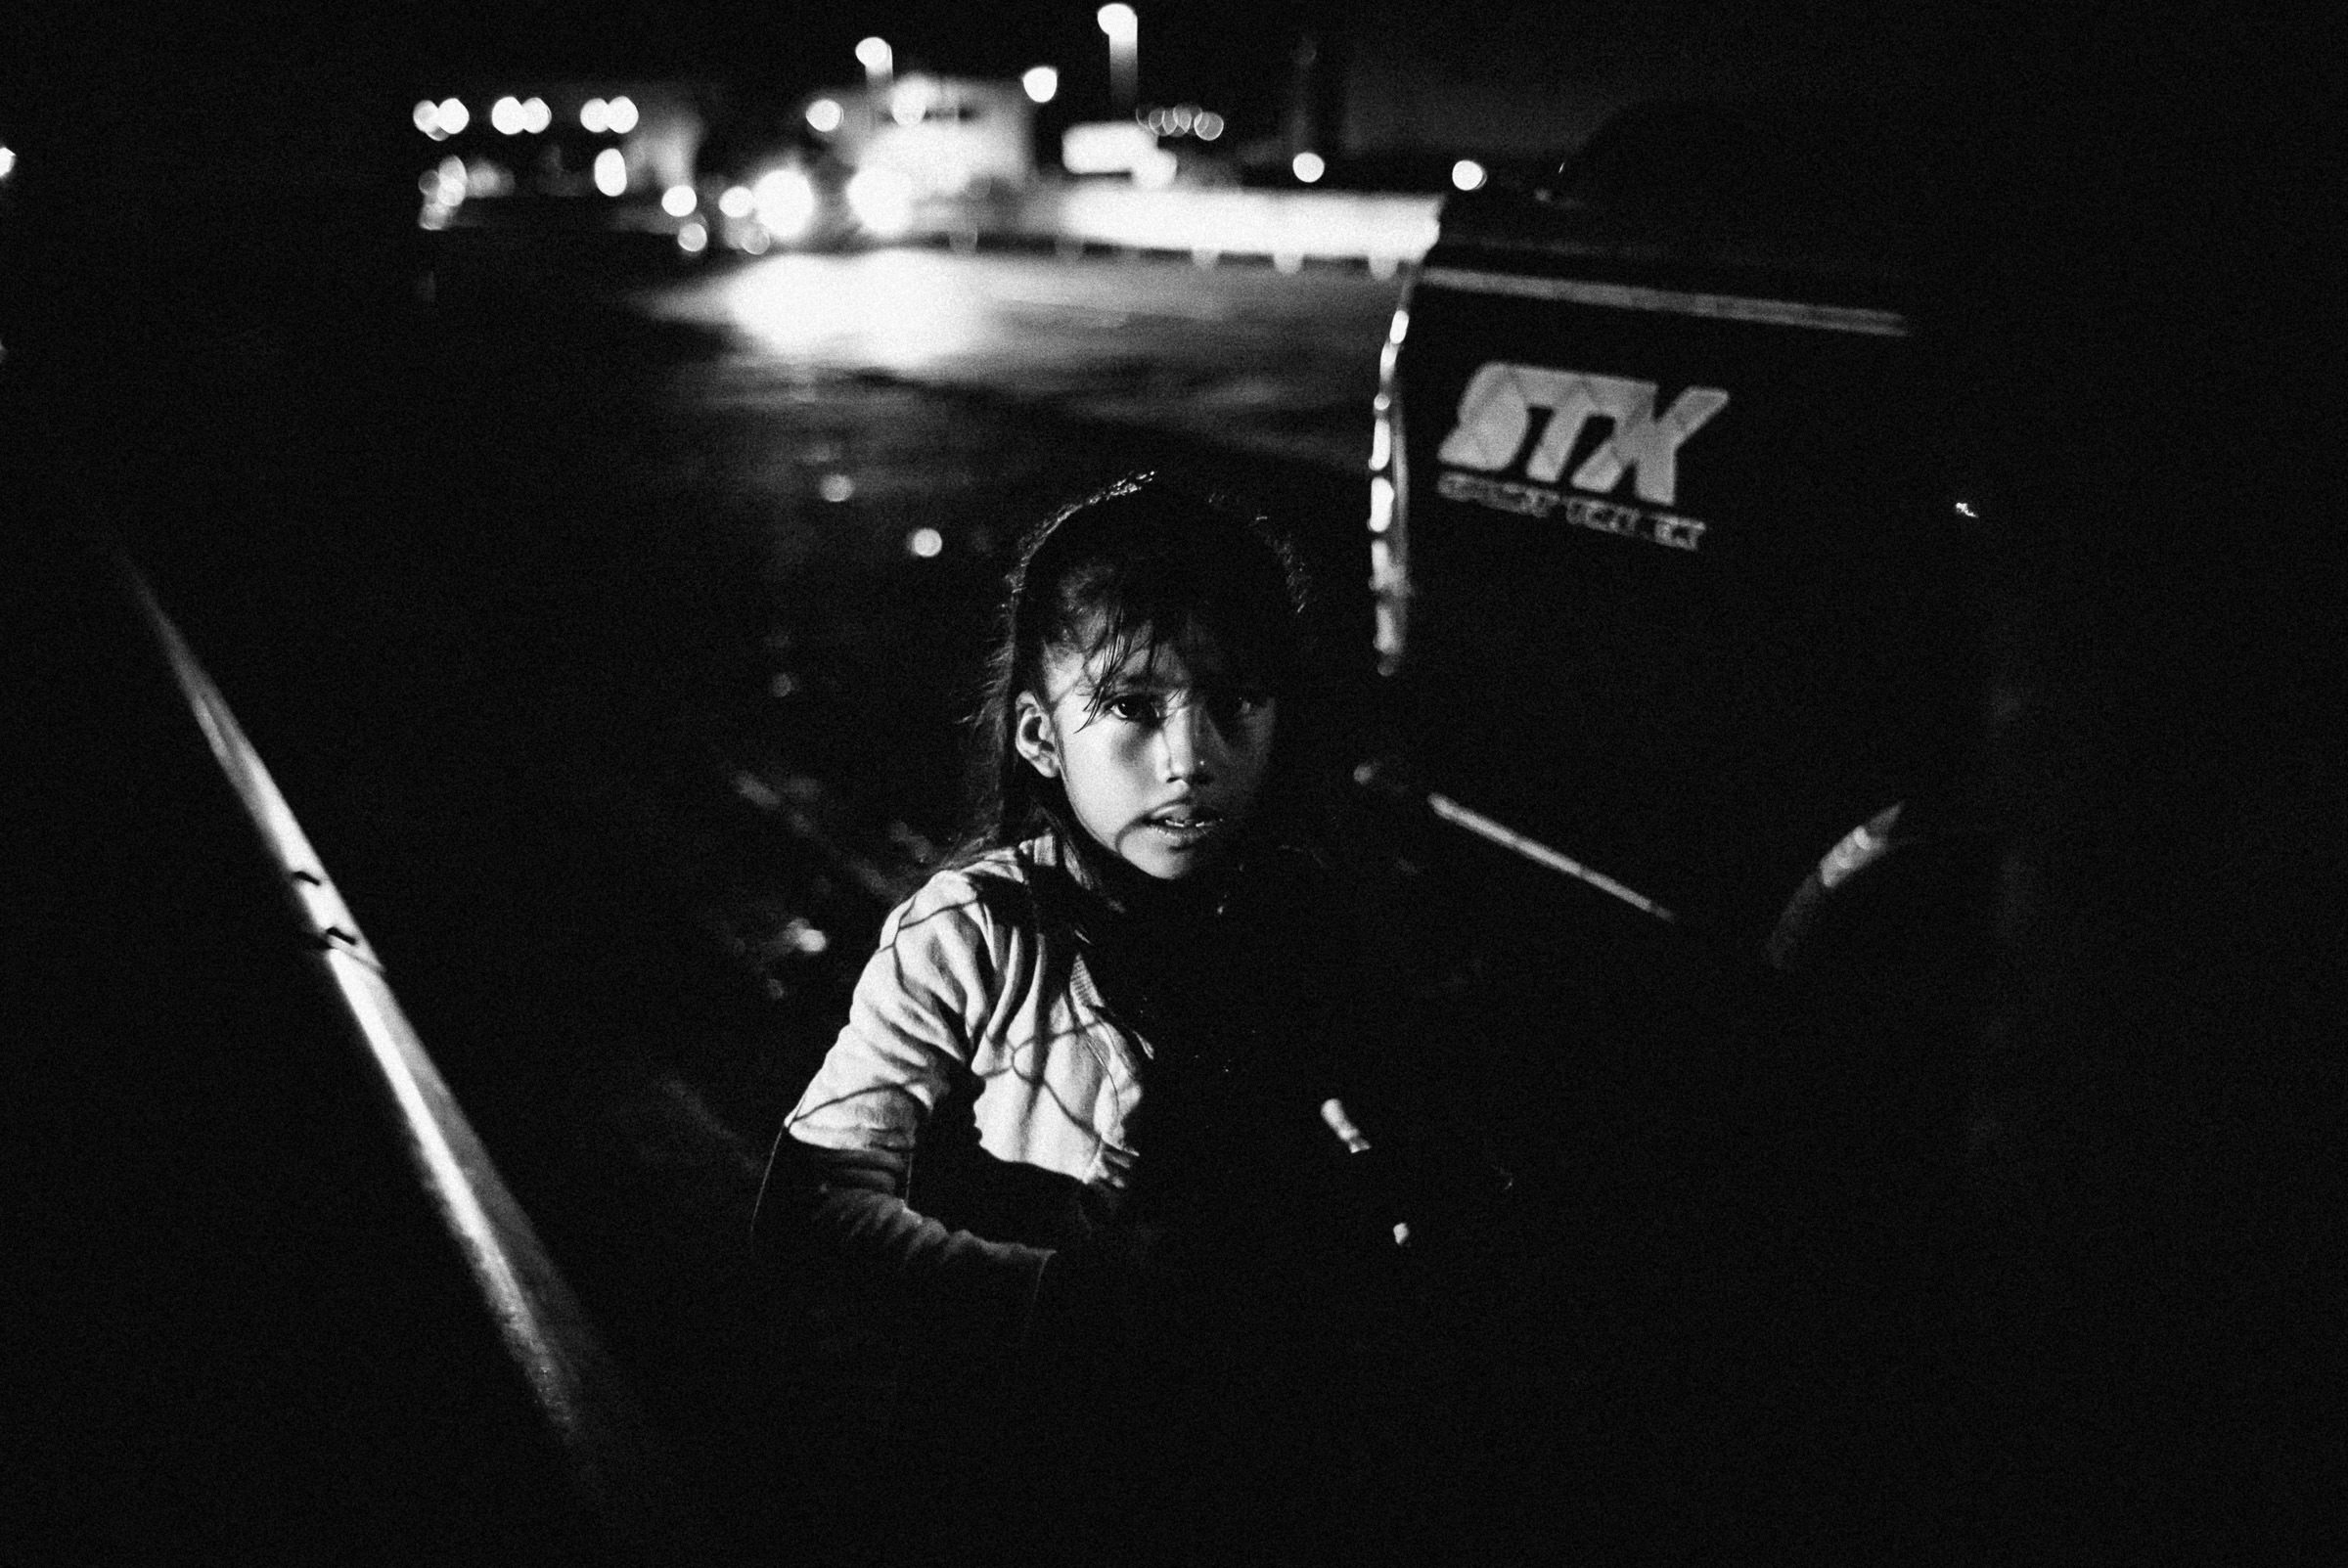 brandon_patoc_travel_photographer_in_mexico_0001.jpg